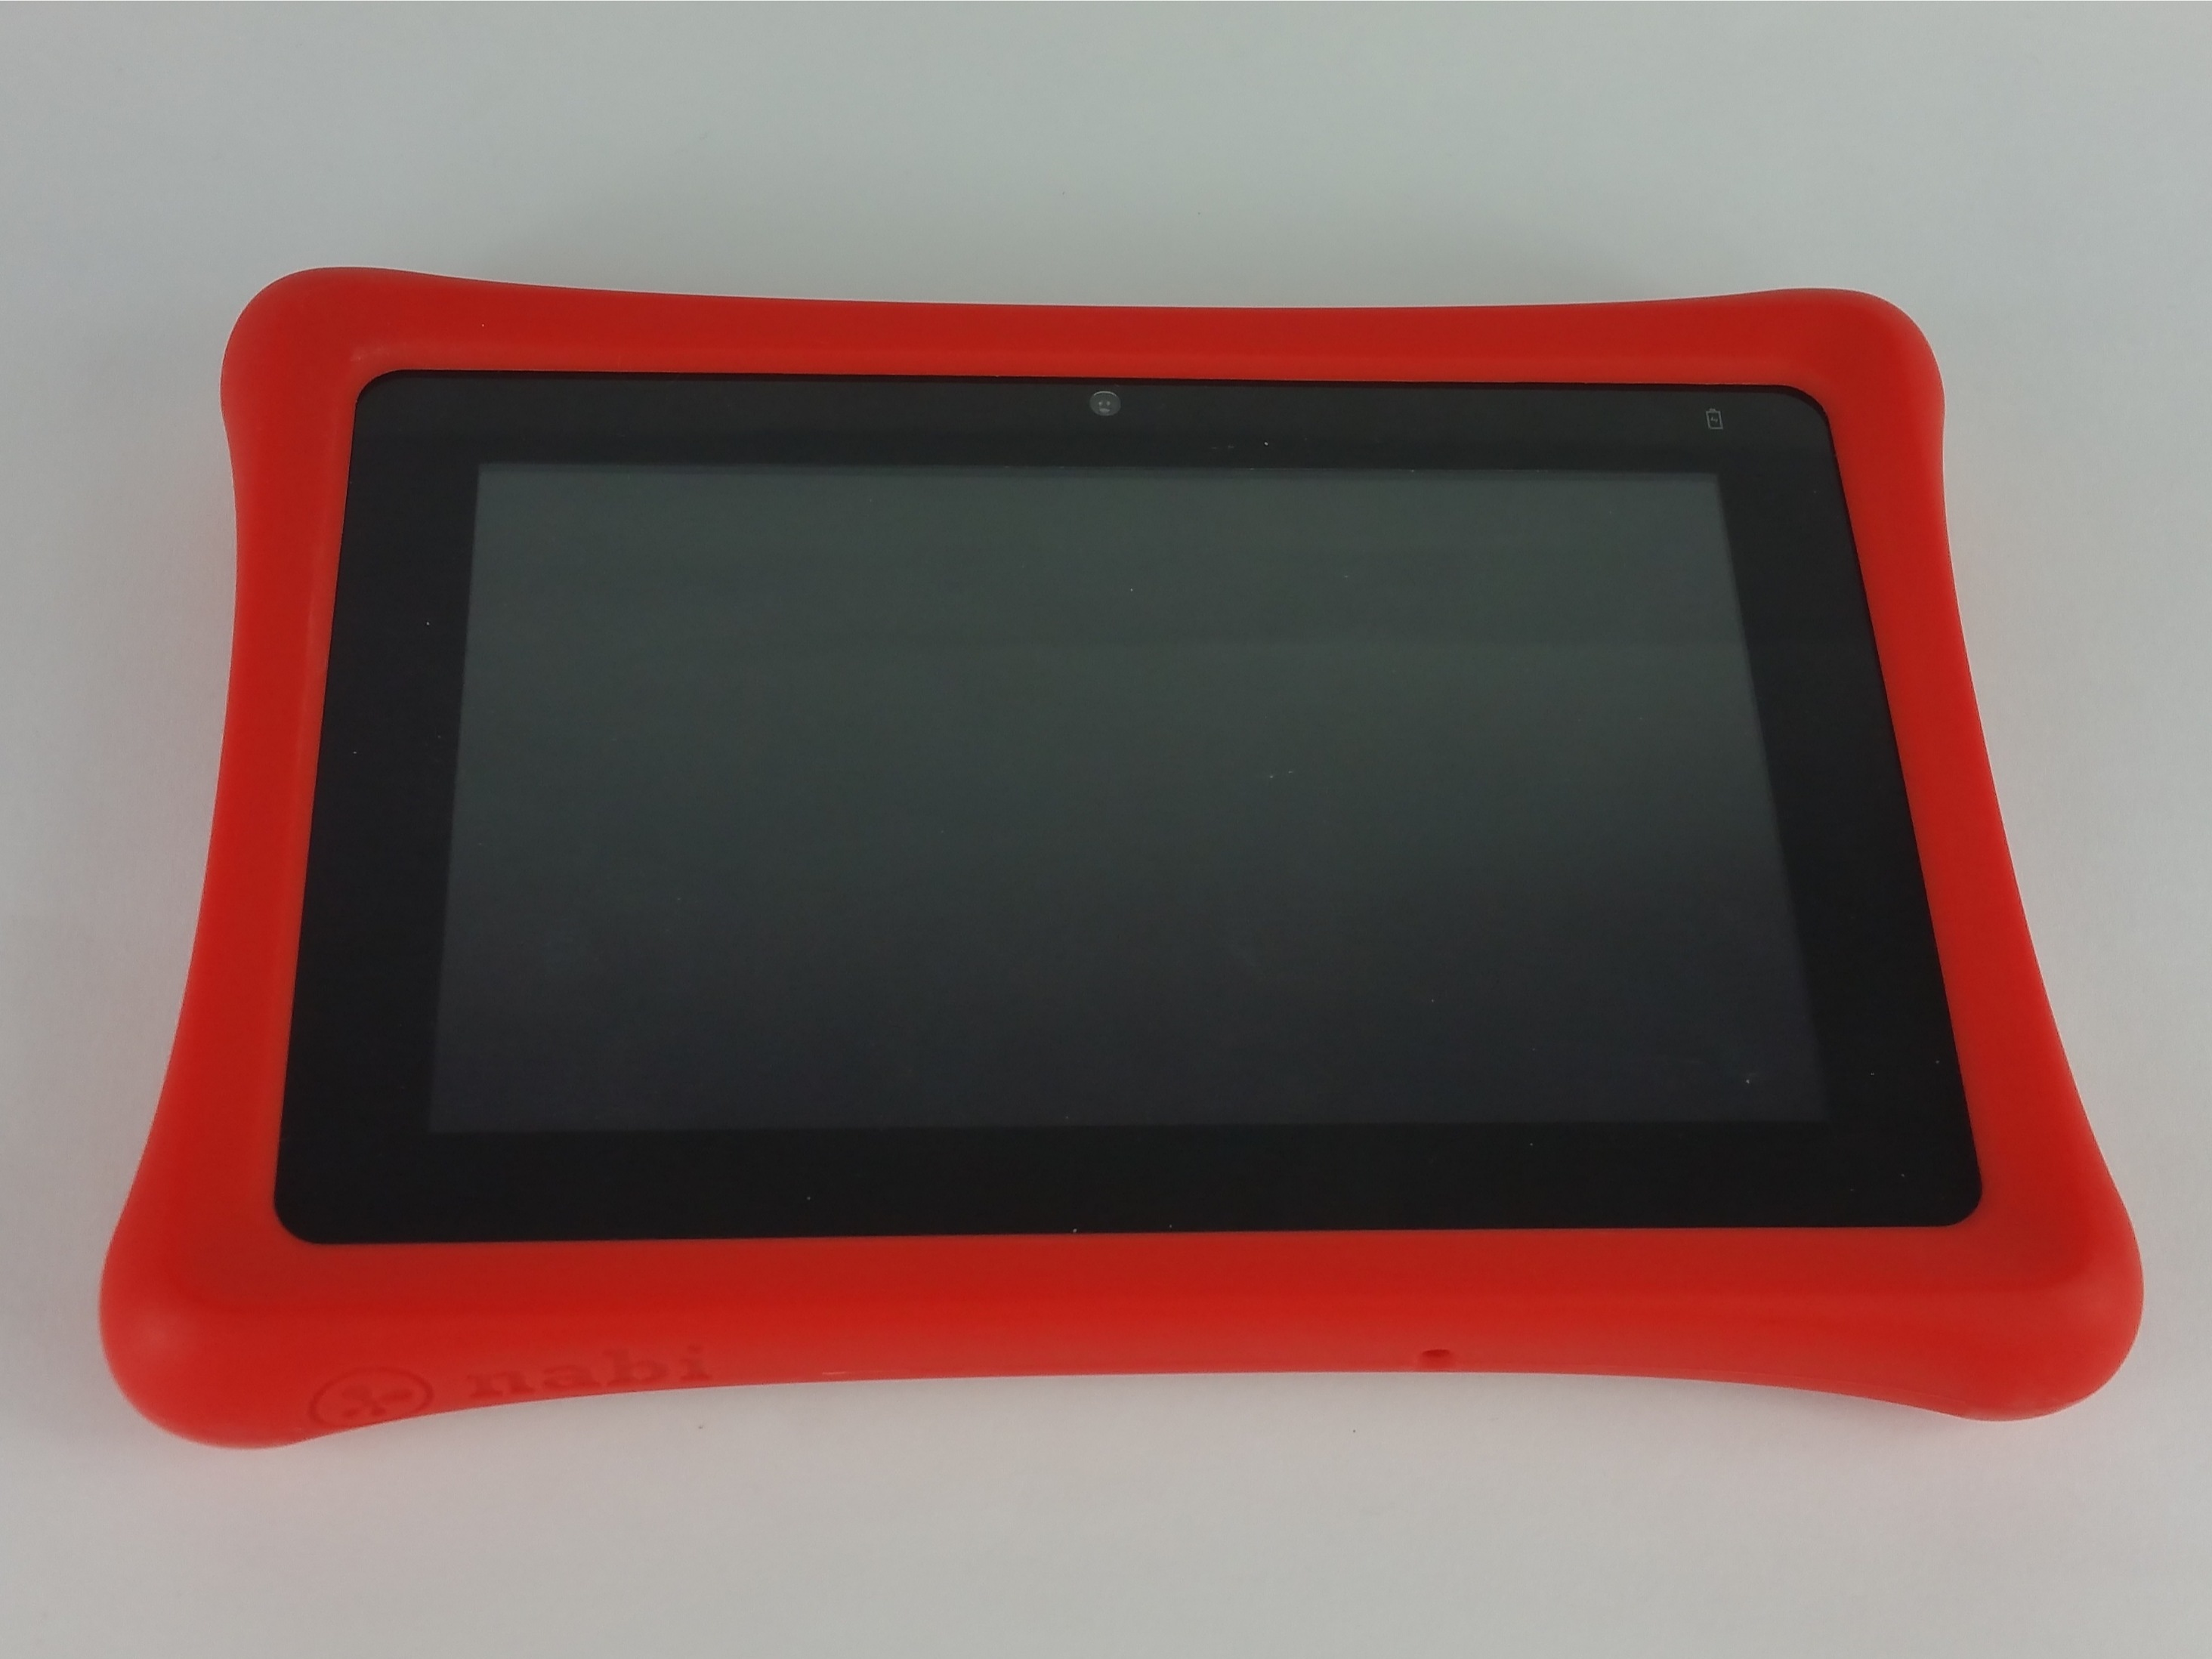 Nabi 2 user manual.